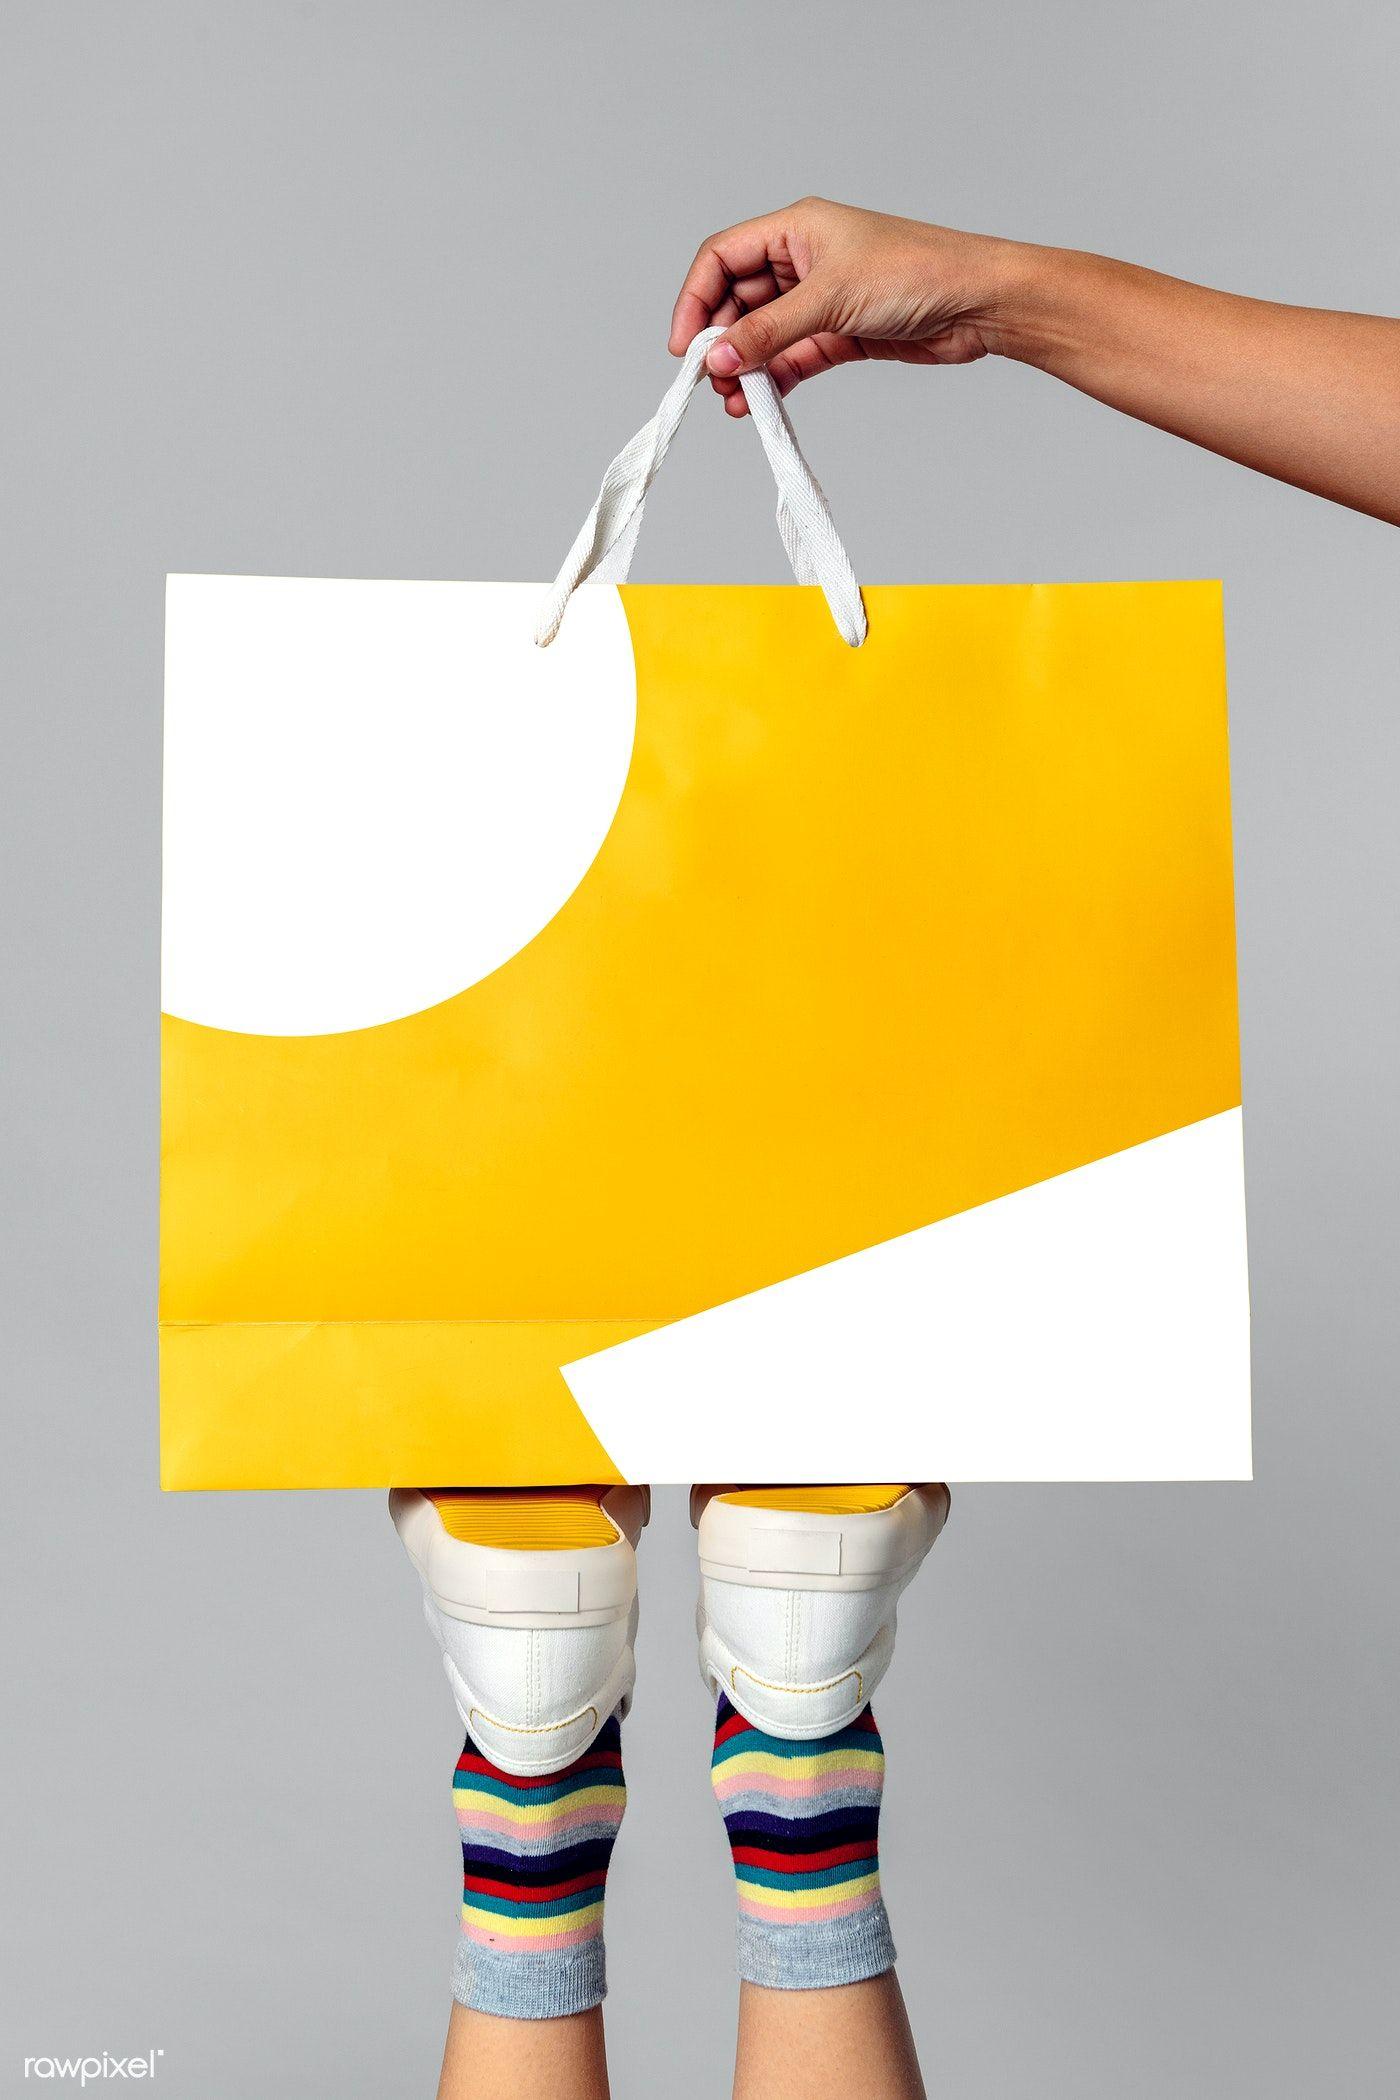 Download Download Premium Psd Of Woman Carrying A Shopping Bag Mockup 2287511 In 2020 Bag Mockup Bags Shopping Bag